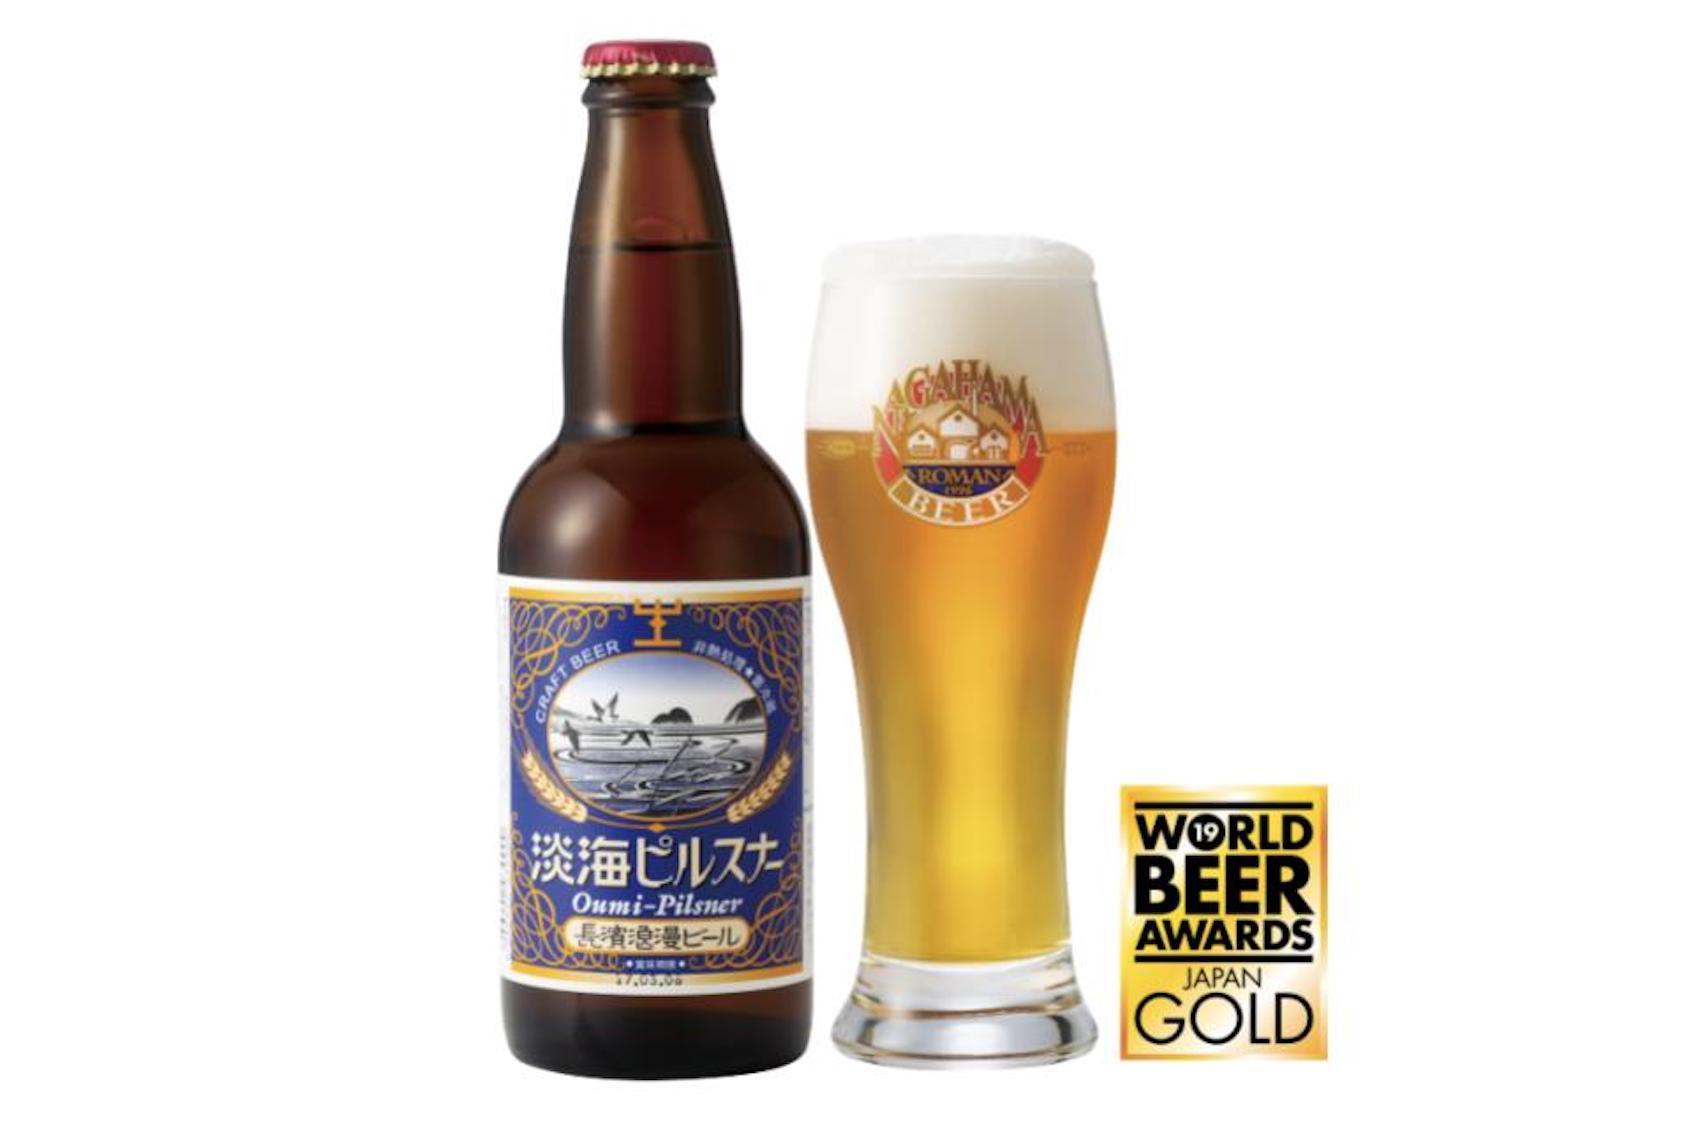 "【DREAMBEERで飲めるビール】歴史ある湖畔の街で造られた、""食事の最初から最後まで楽しめる""ビール『淡海ピルスナー』"